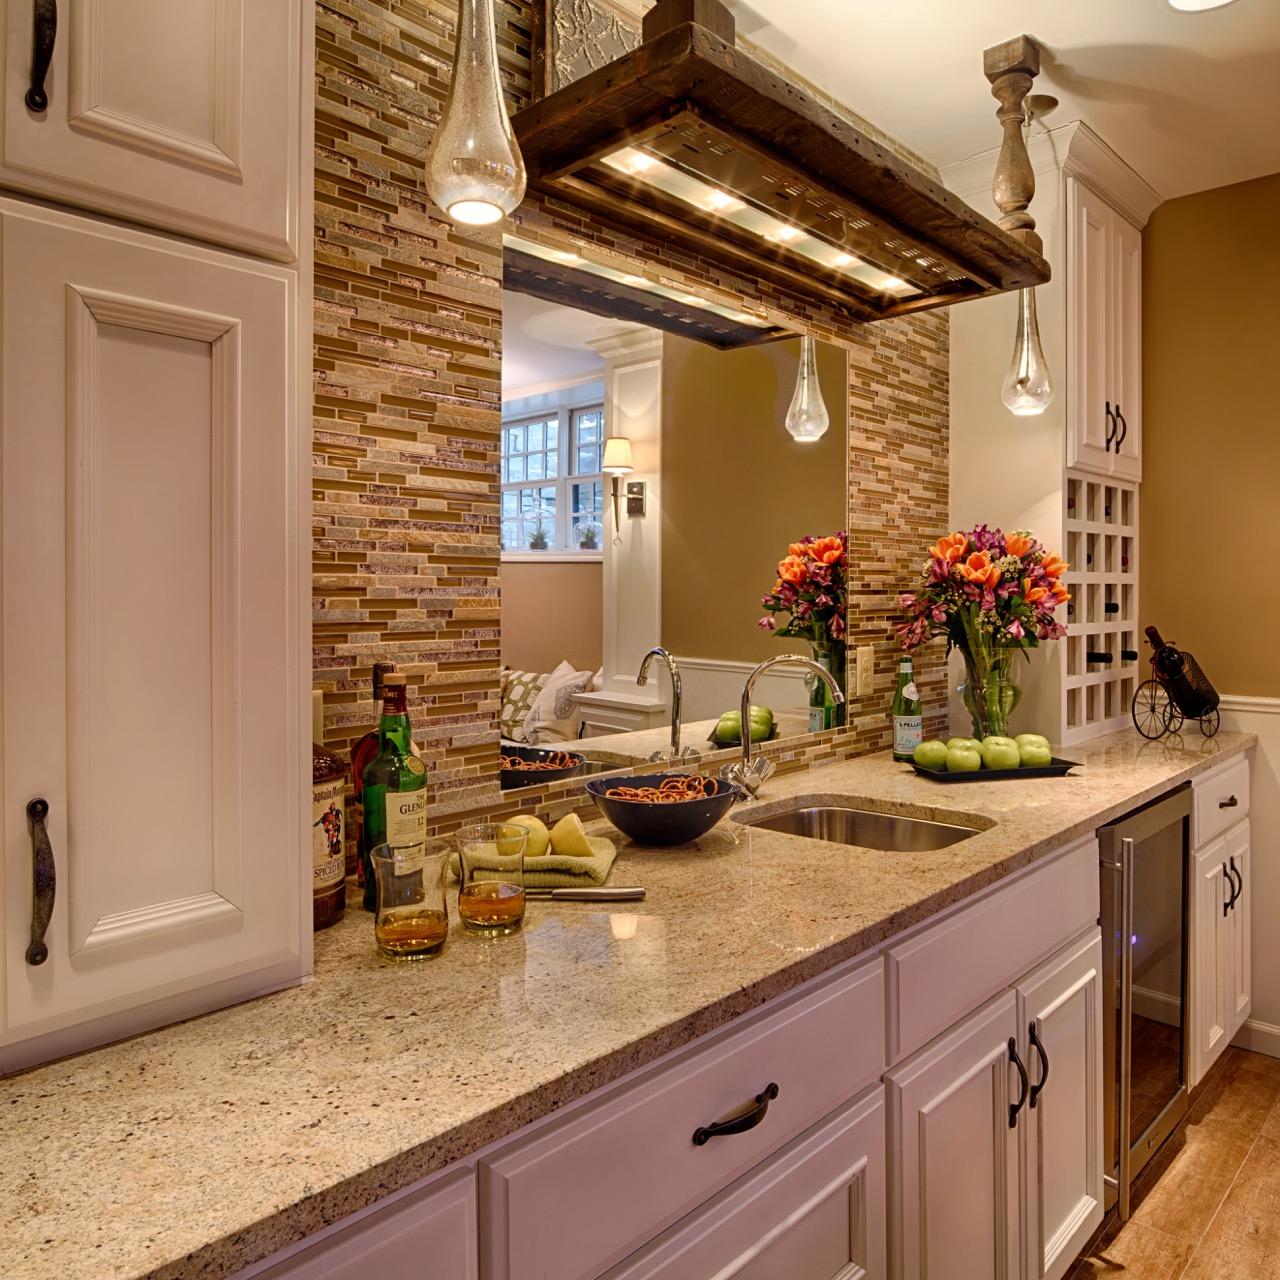 Mom's Design Build - Interior Basement Kitchen Sink Remodel